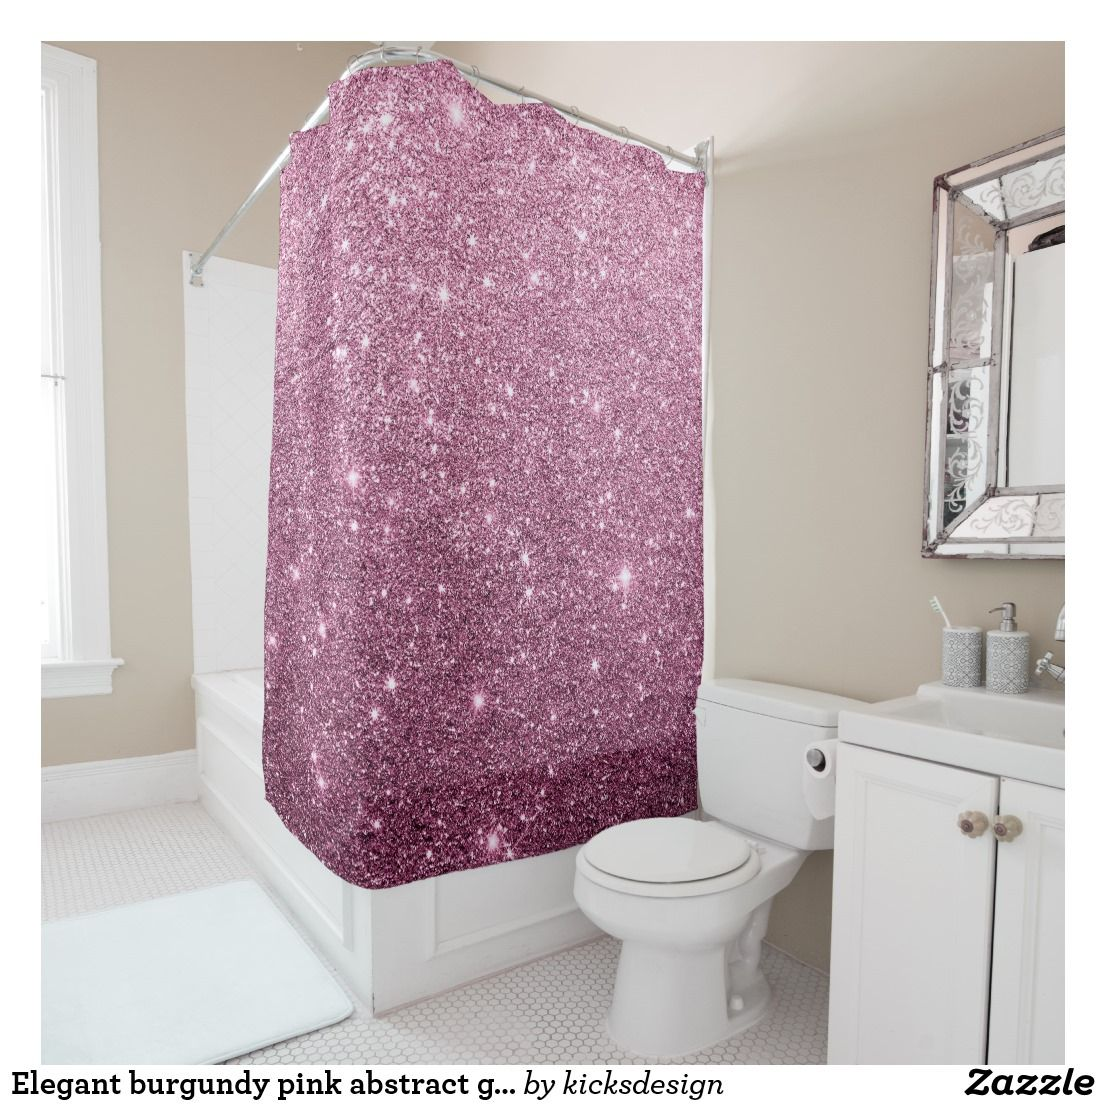 Elegant Burgundy Pink Abstract Girly Glitter Shower Curtain